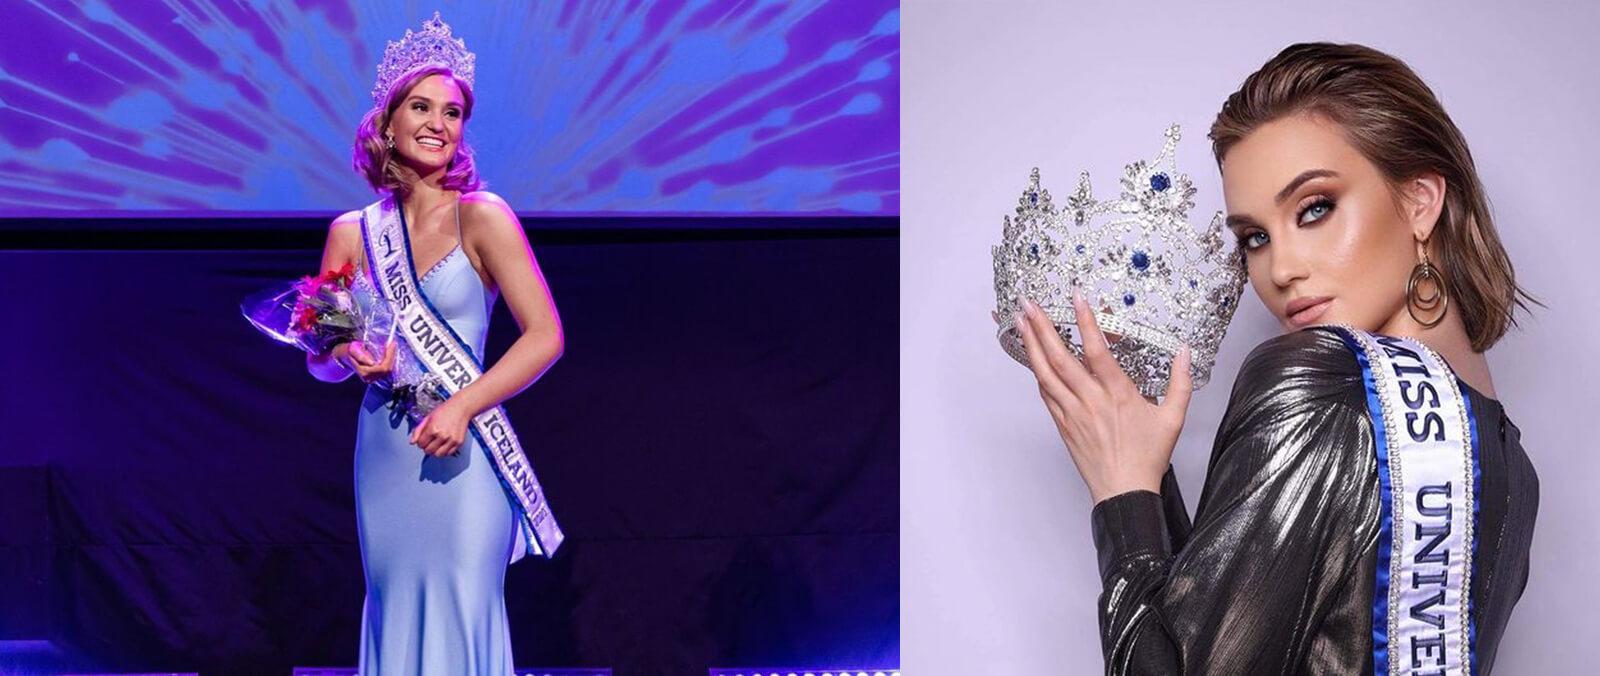 Interview with Elisabet Hulda, Miss Universe Iceland 2020